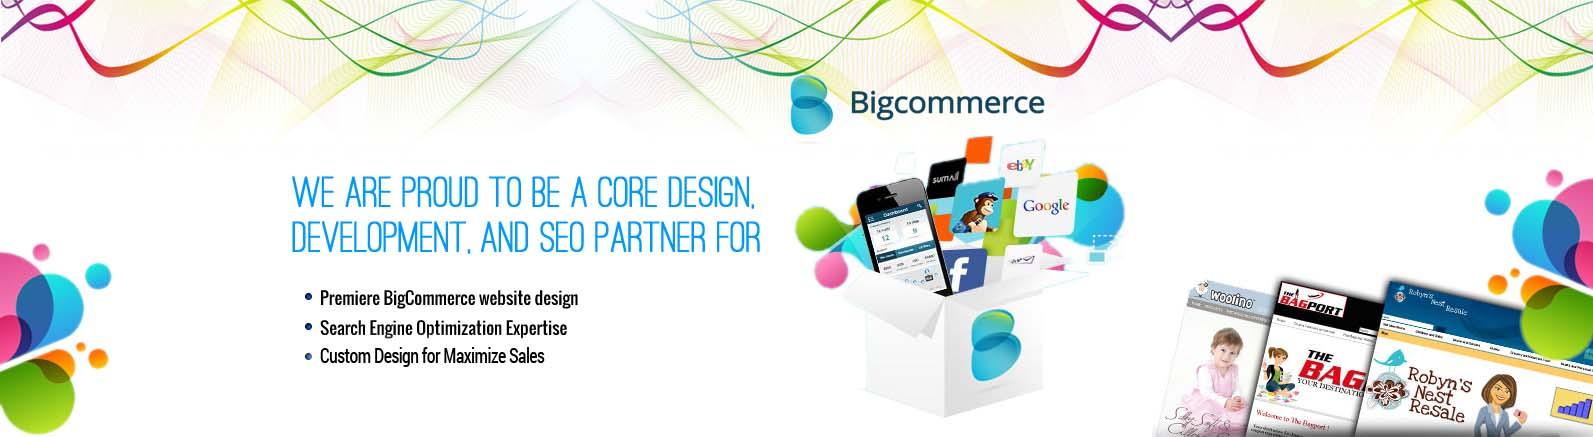 bigcommerce_development-copy